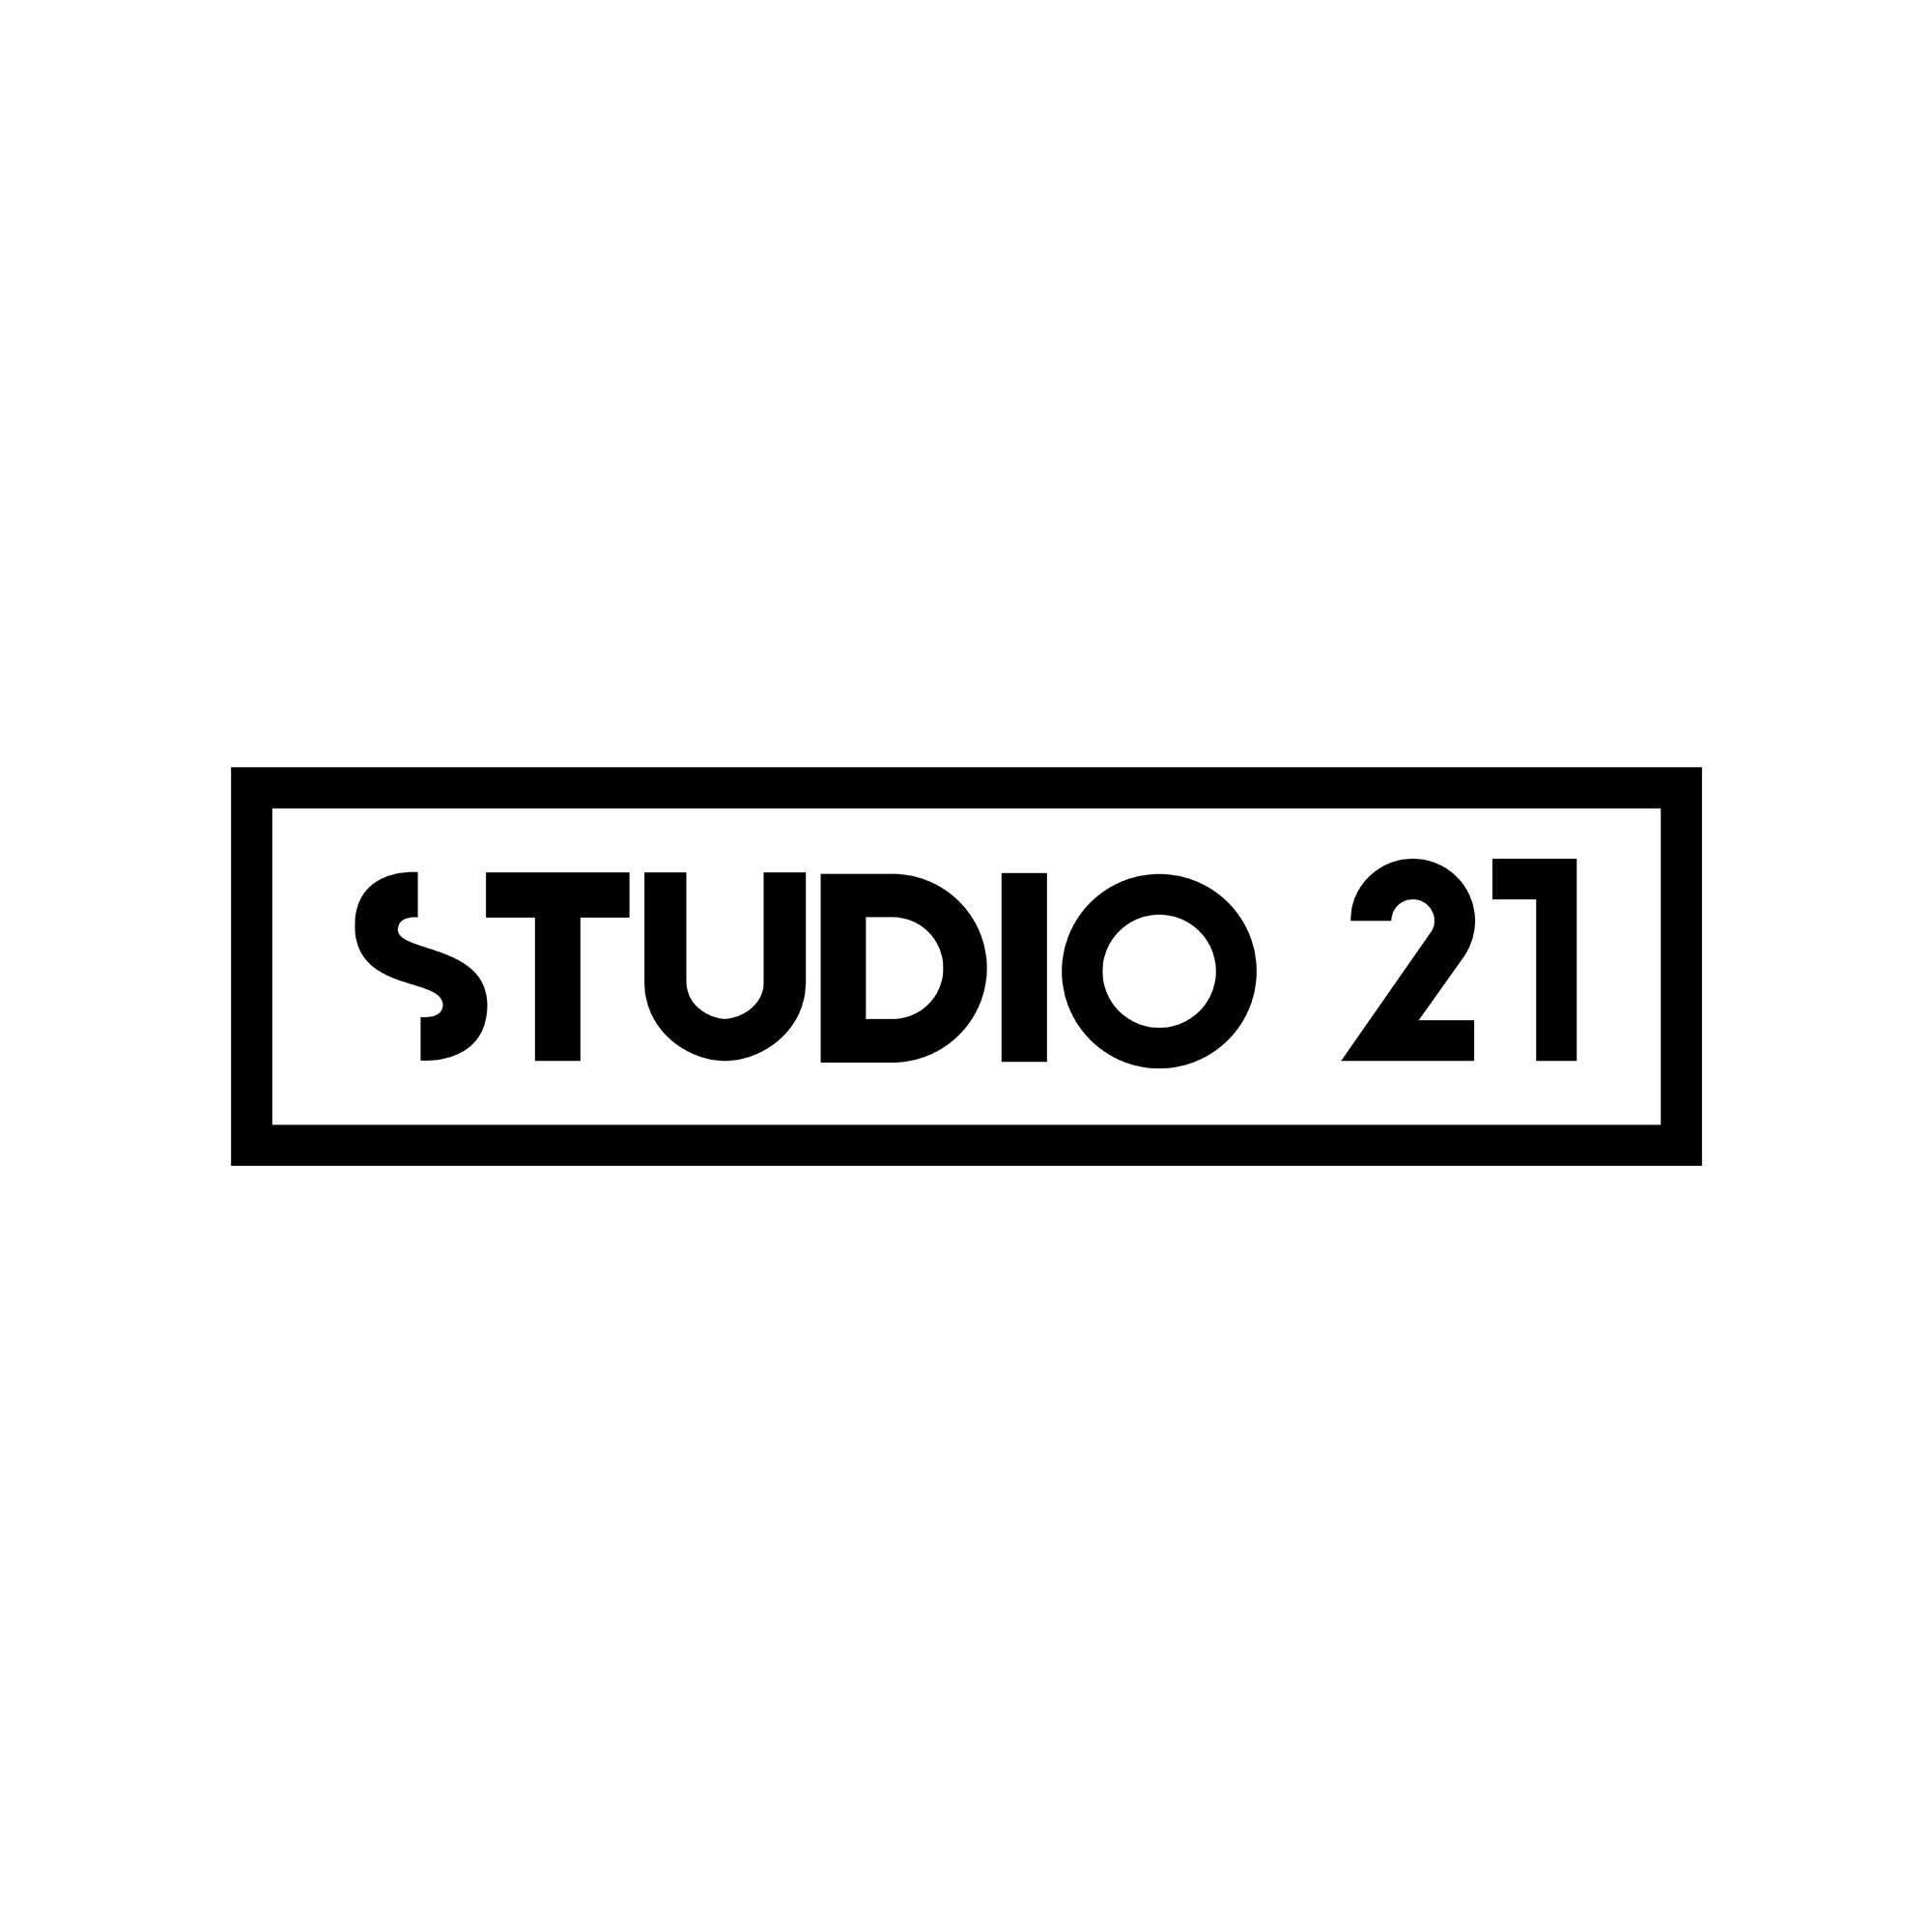 rádio Studio 21 ex (Спорт FM) 93.2 FM Rússia, Moscou